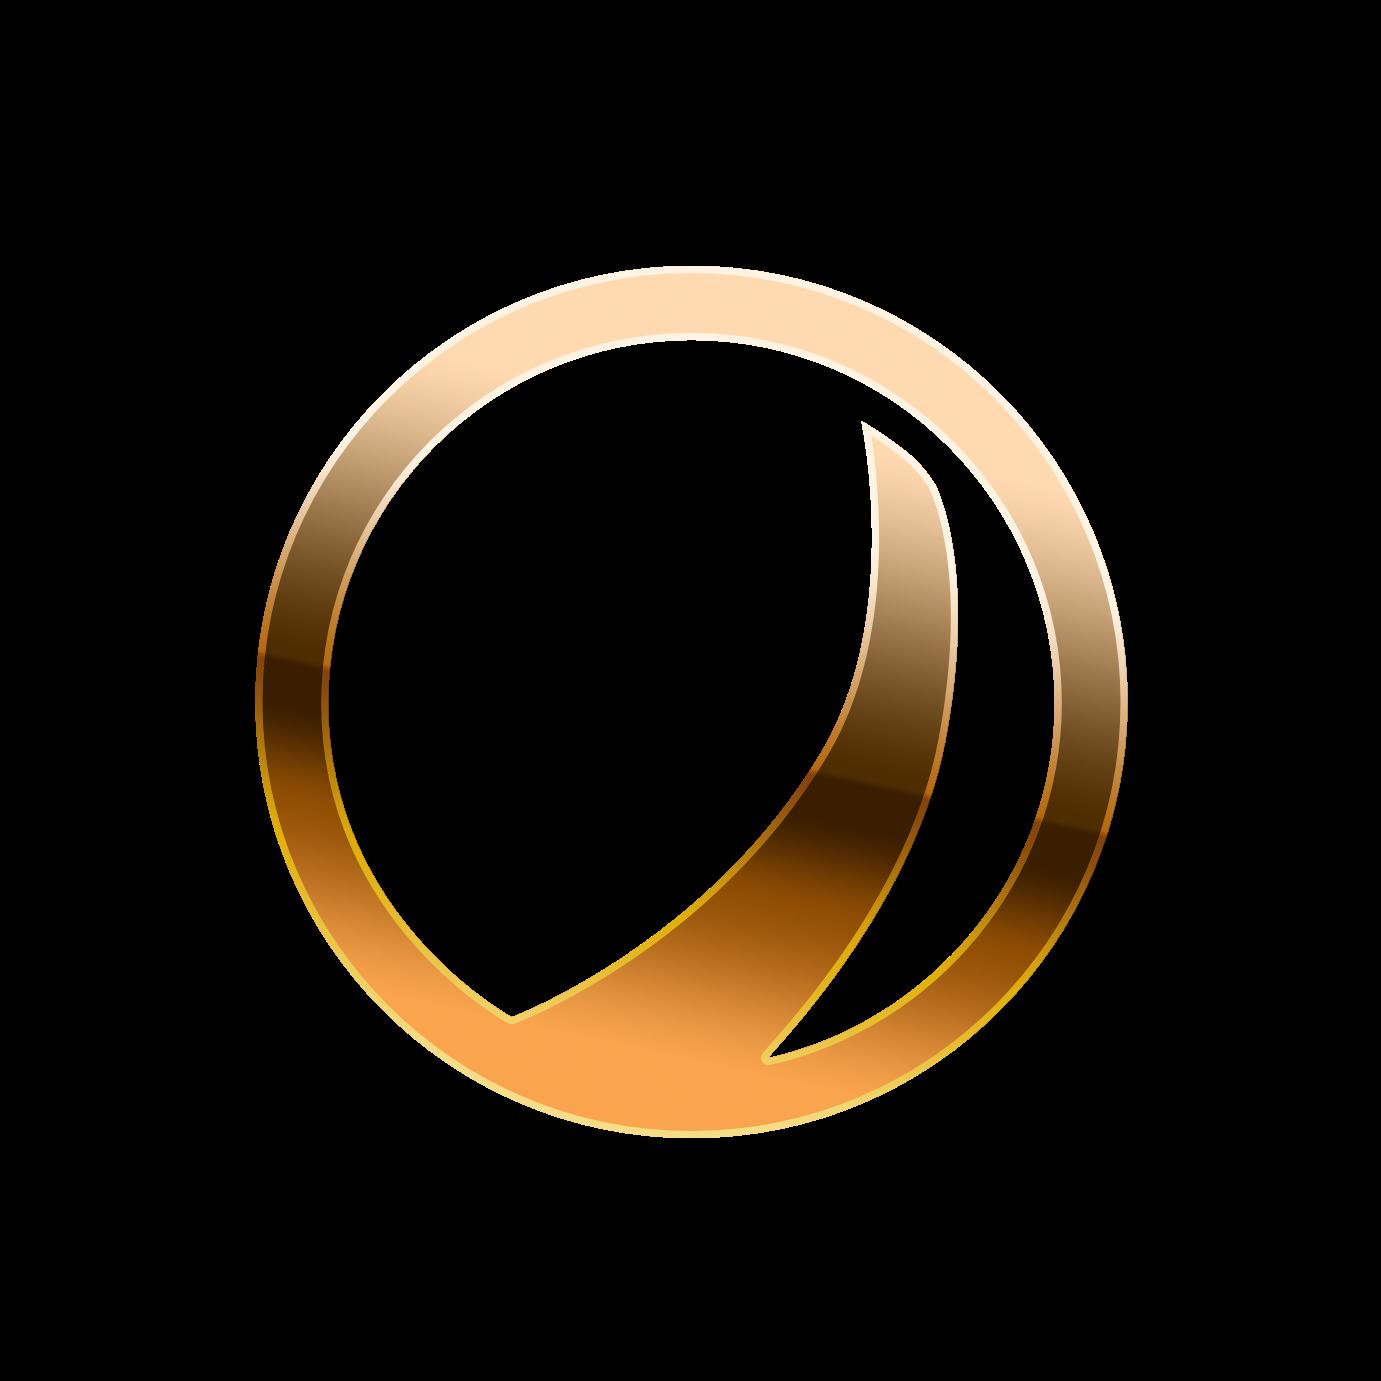 Inutero4 S Rocket League Profile